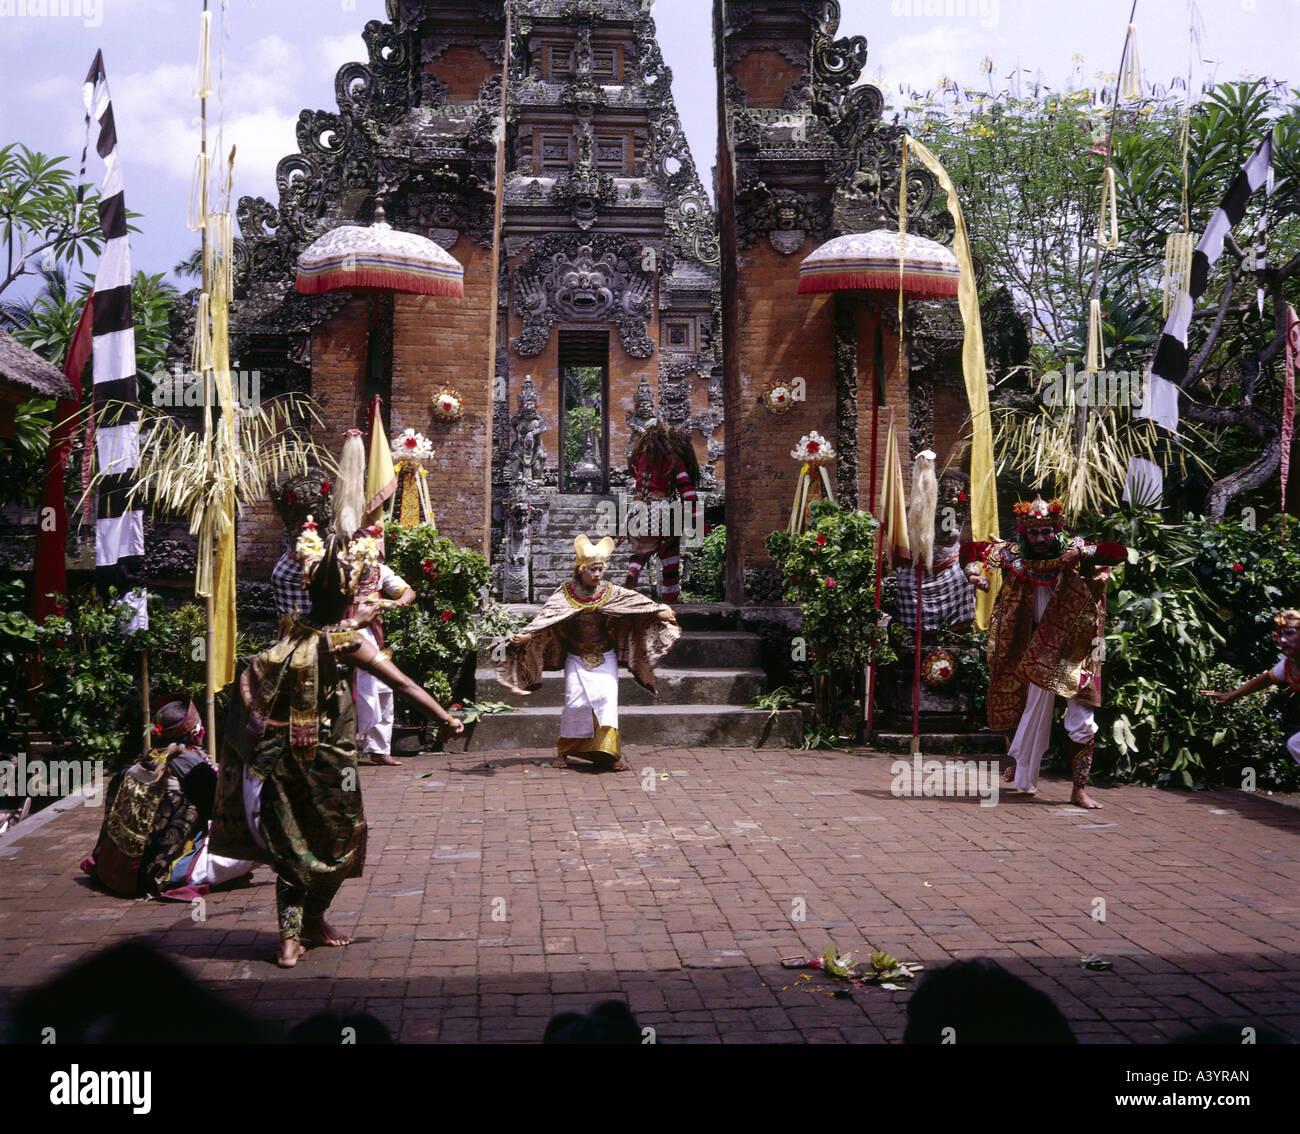 Billet /géographie, INDONÉSIE, Bali, tradition / folklore, danse Barong, apparition de Dewi Kunti, l'Asie Photo Stock